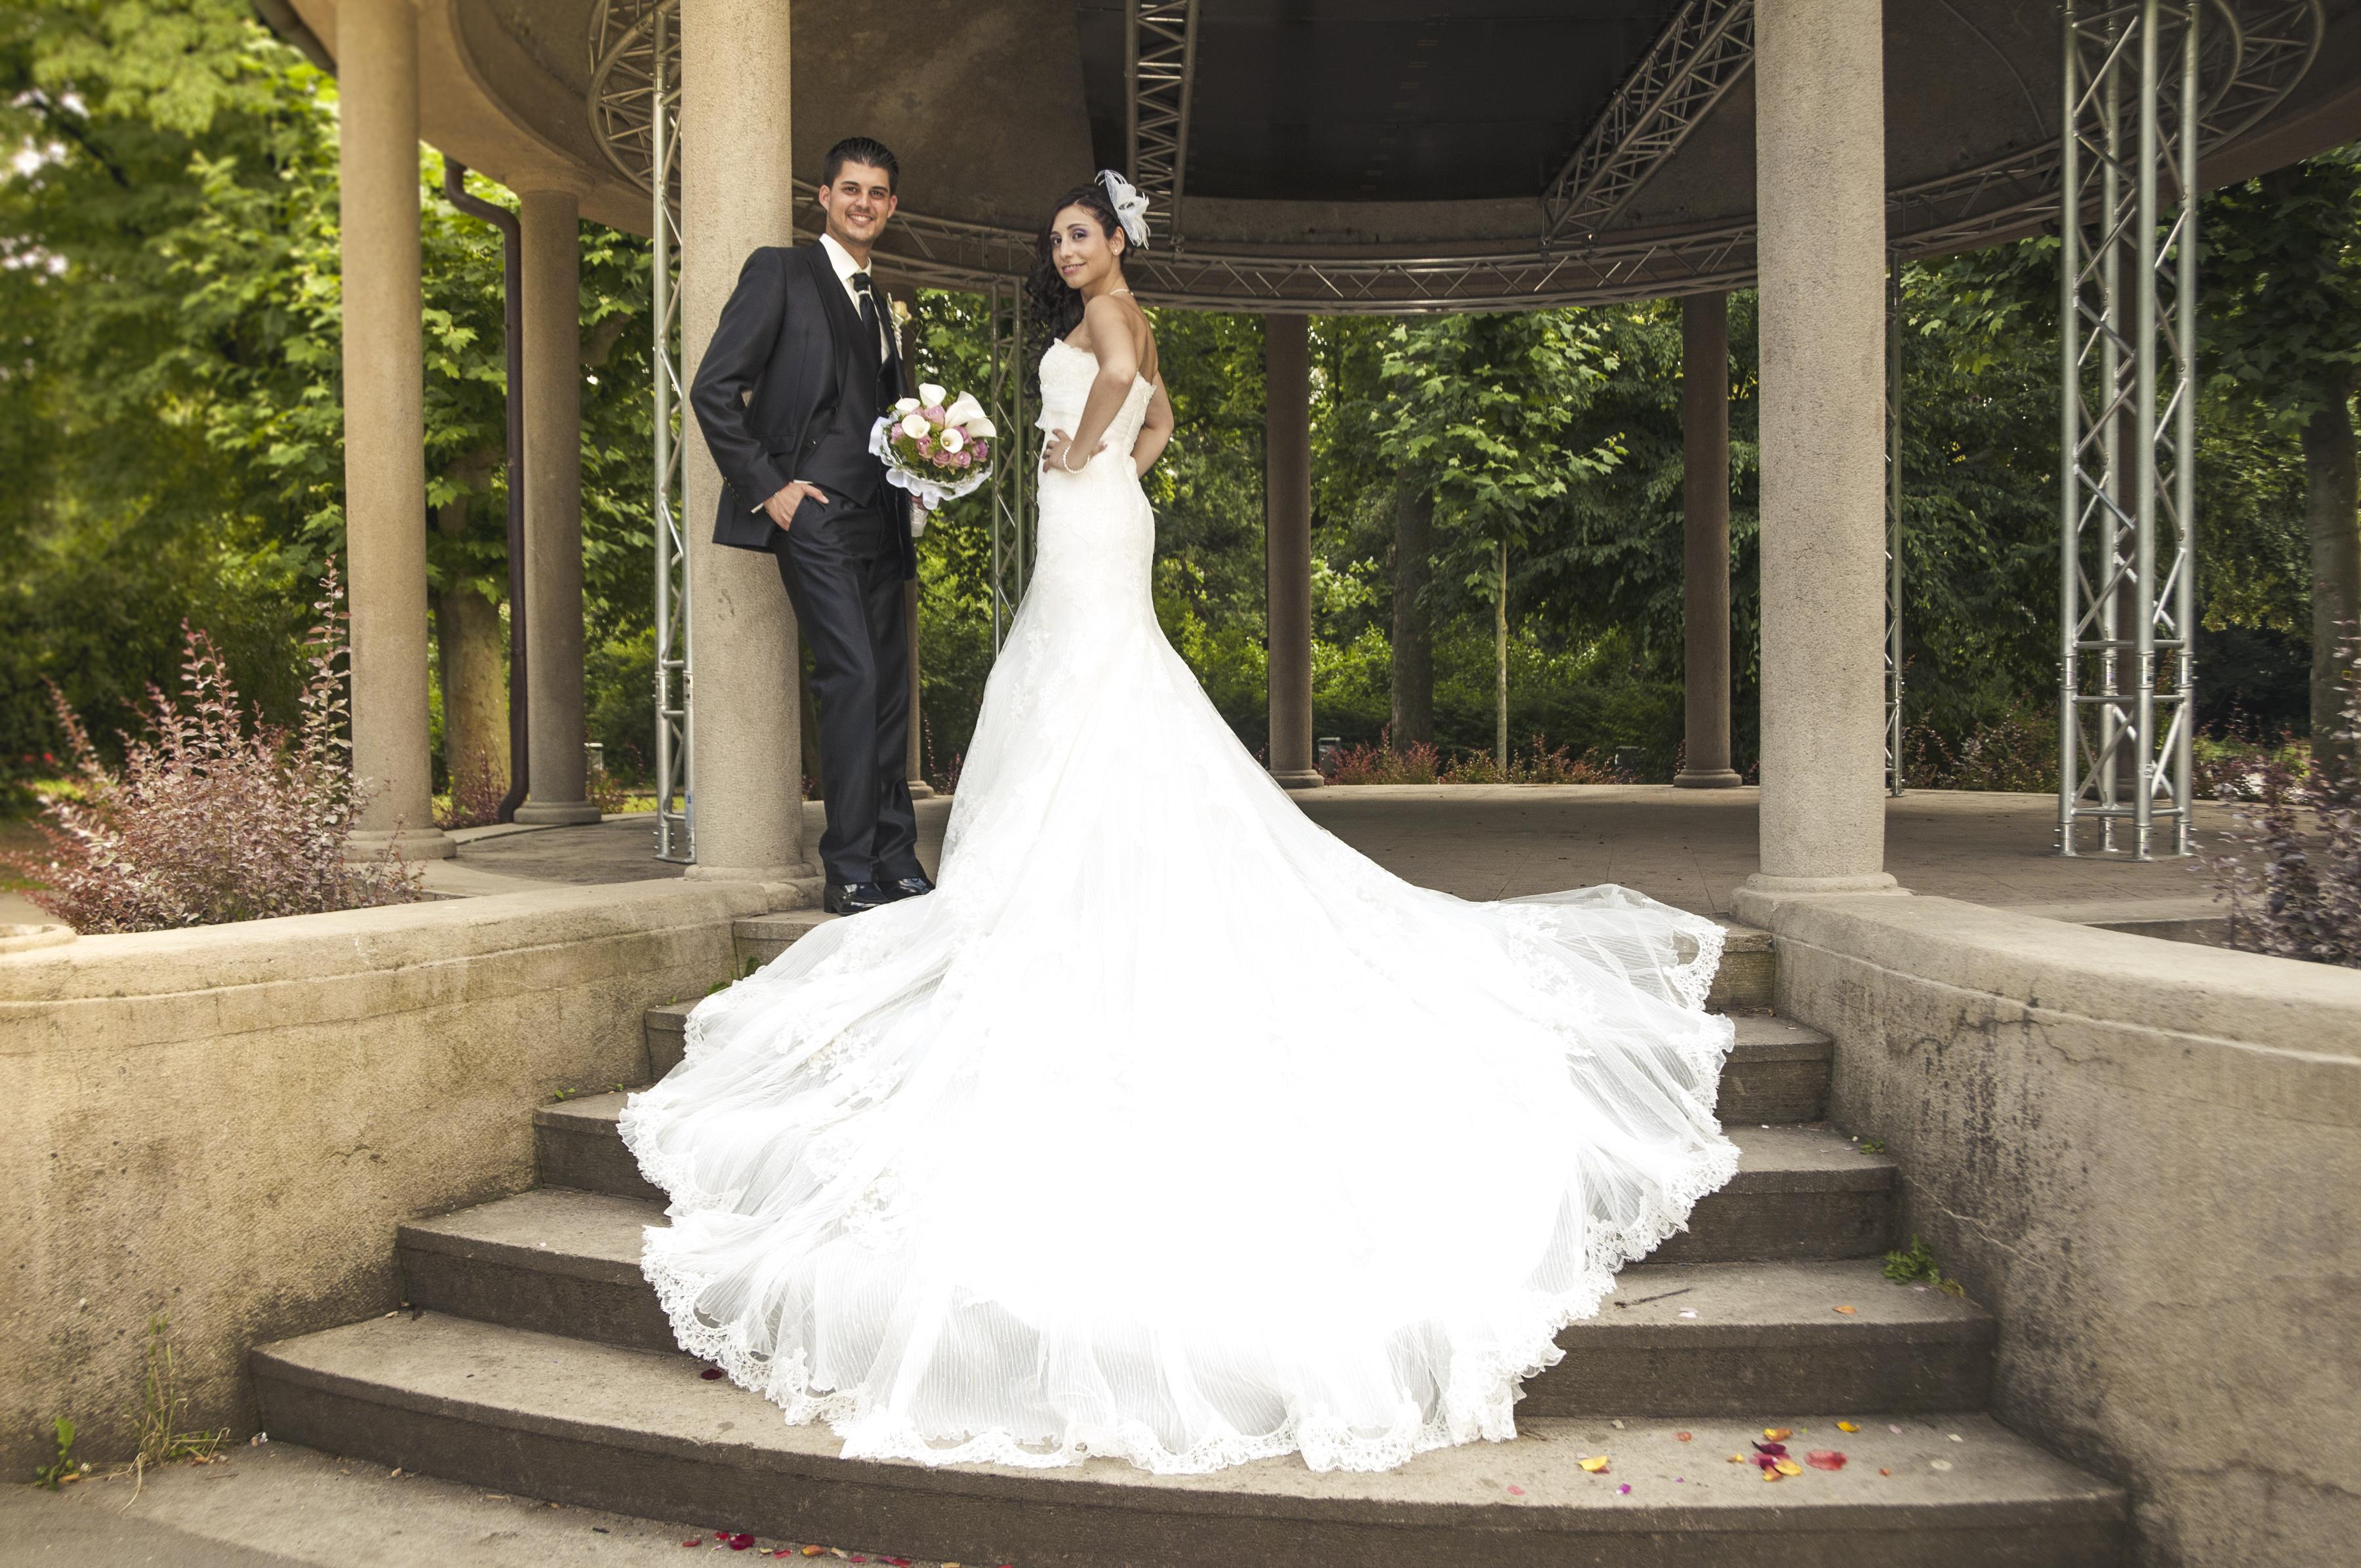 https://sleeklens.com/wp-content/uploads/2018/09/wedding-lightroom-presets-signature-bride-groom-after-4.jpg